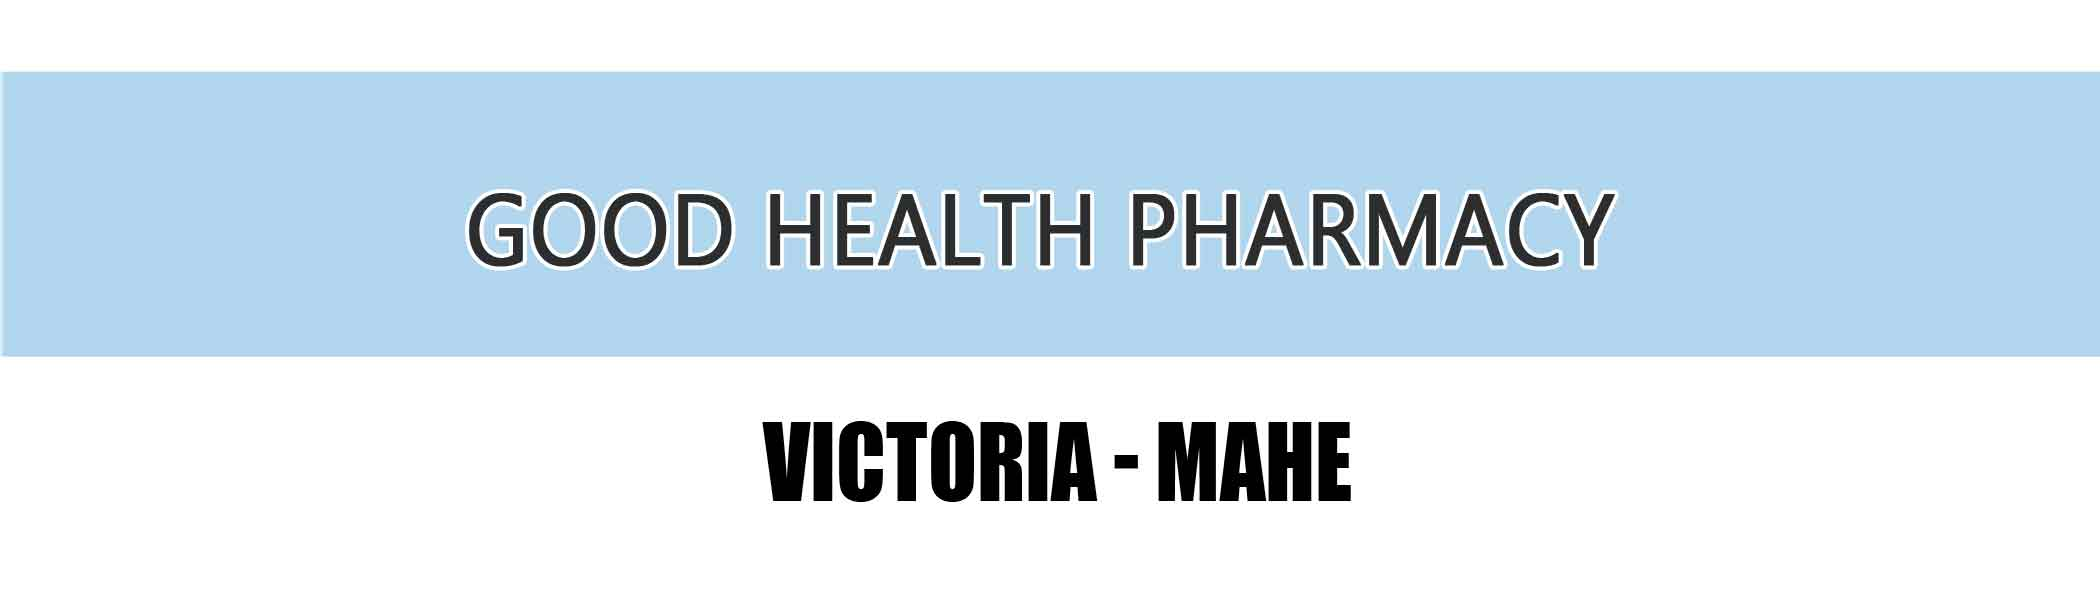 good-health-pharmacy, Pharmacies in Seychelles Islands